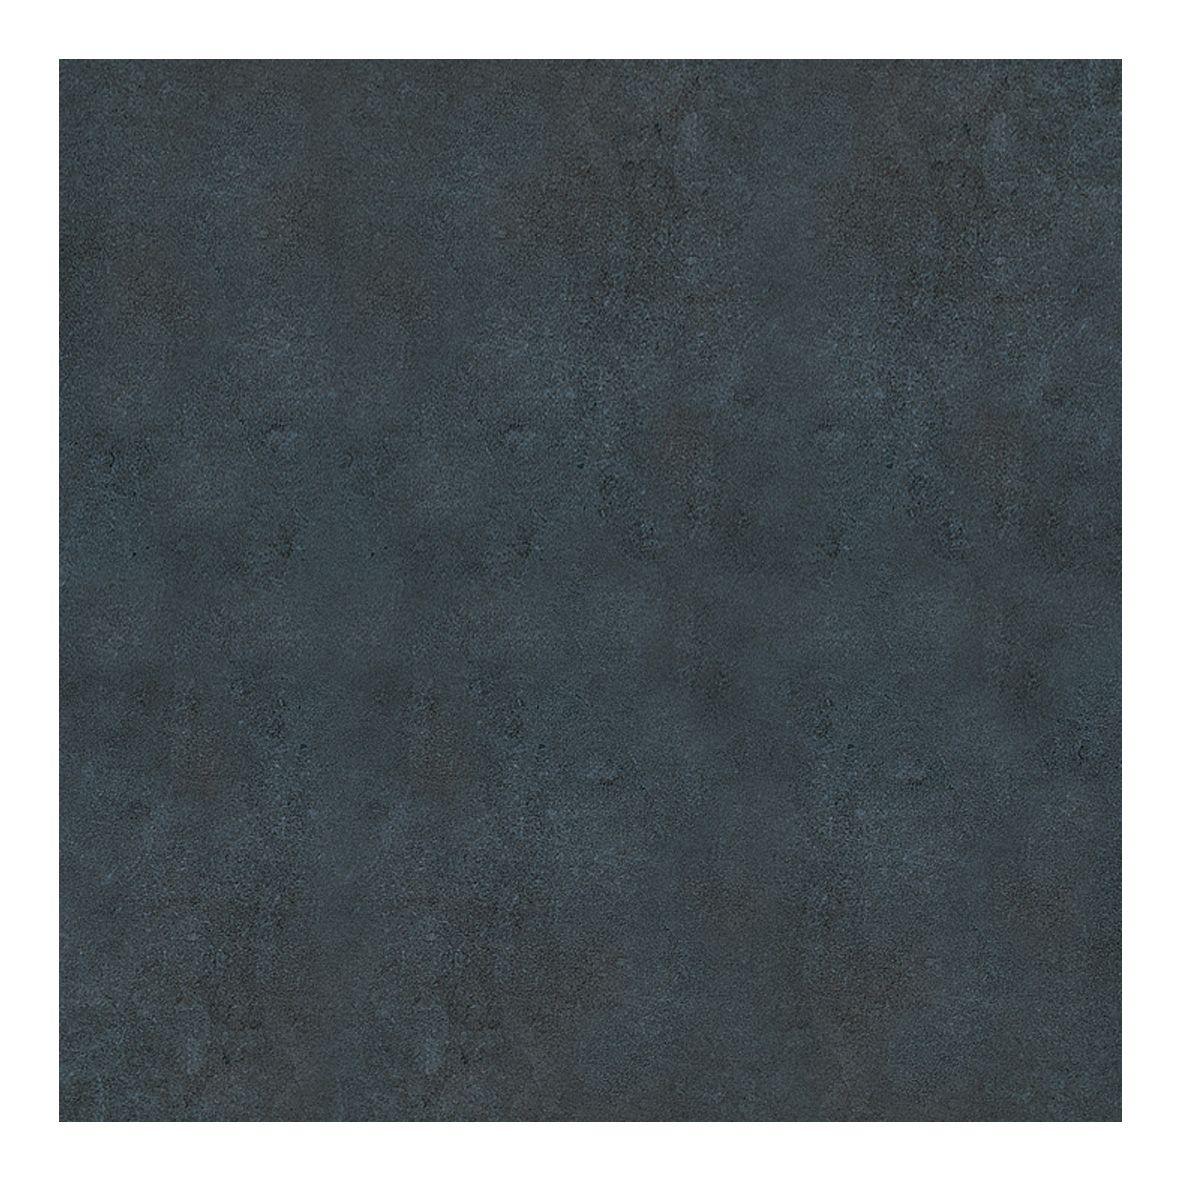 Gemini young stone dark grey 600x600 wall floor tiles kgli gemini young stone dark grey 600x600 wall floor tiles dailygadgetfo Choice Image